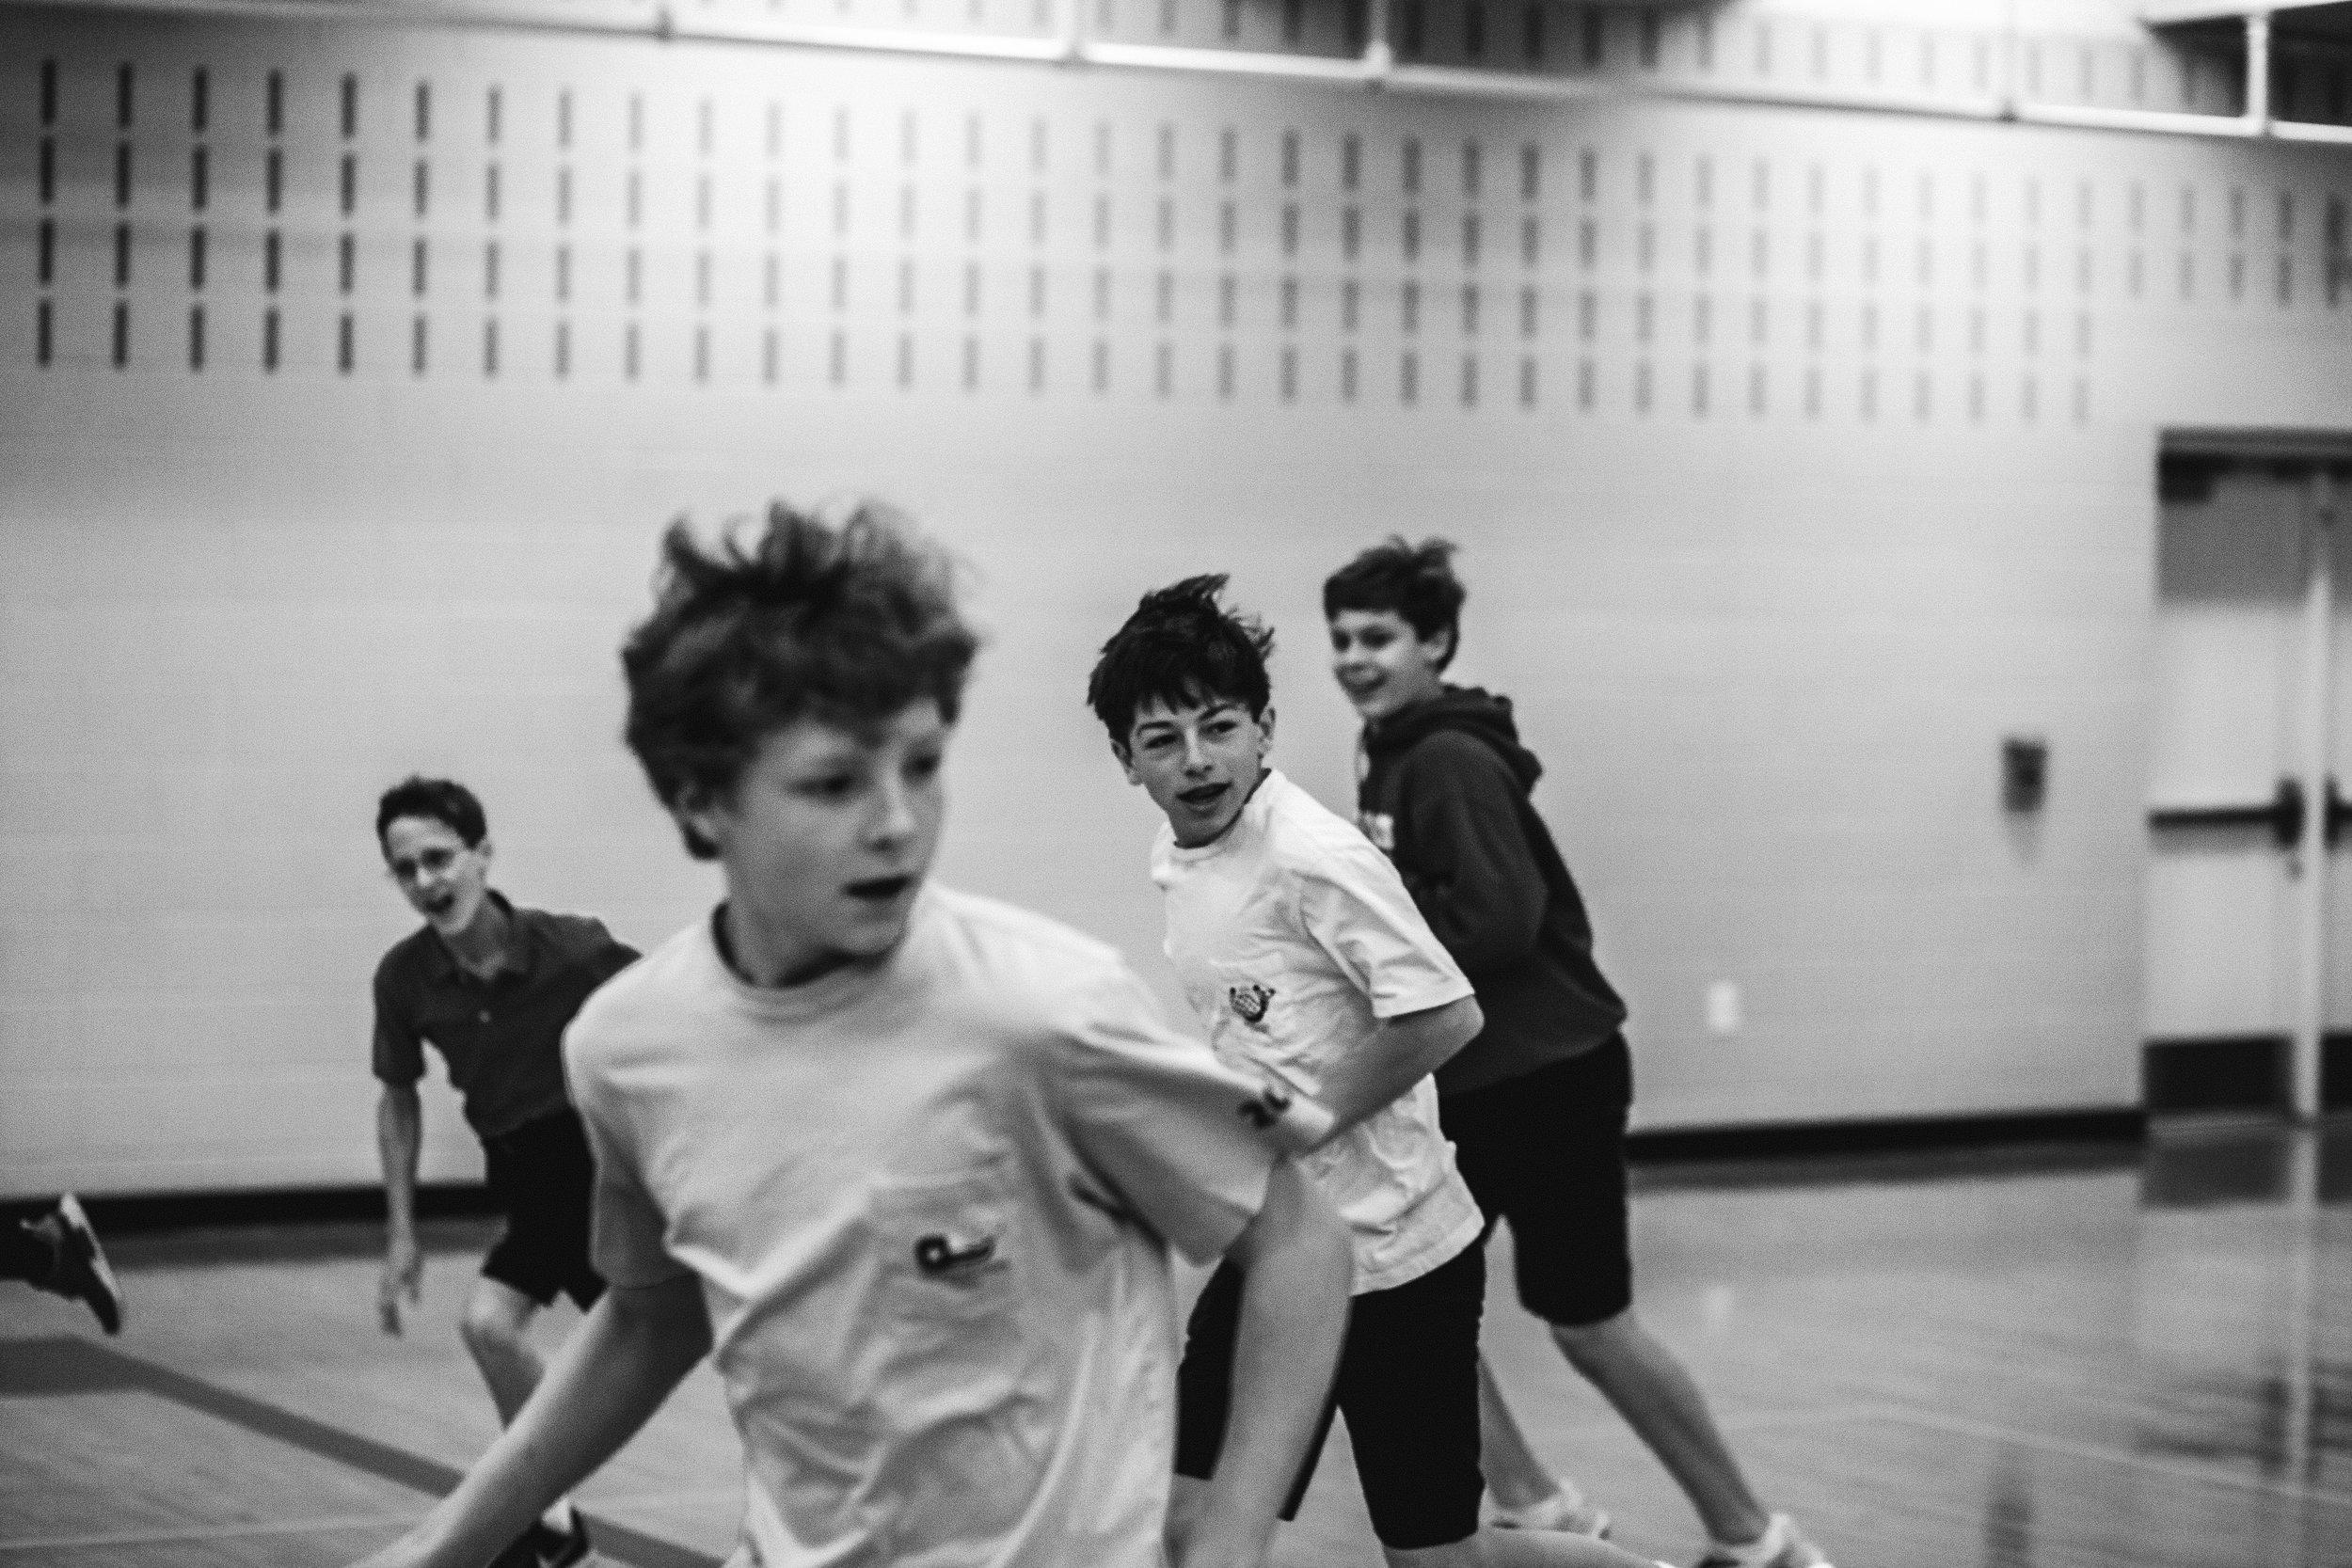 Houston School Photography - 6th River Oaks Baptist School-5049.jpg